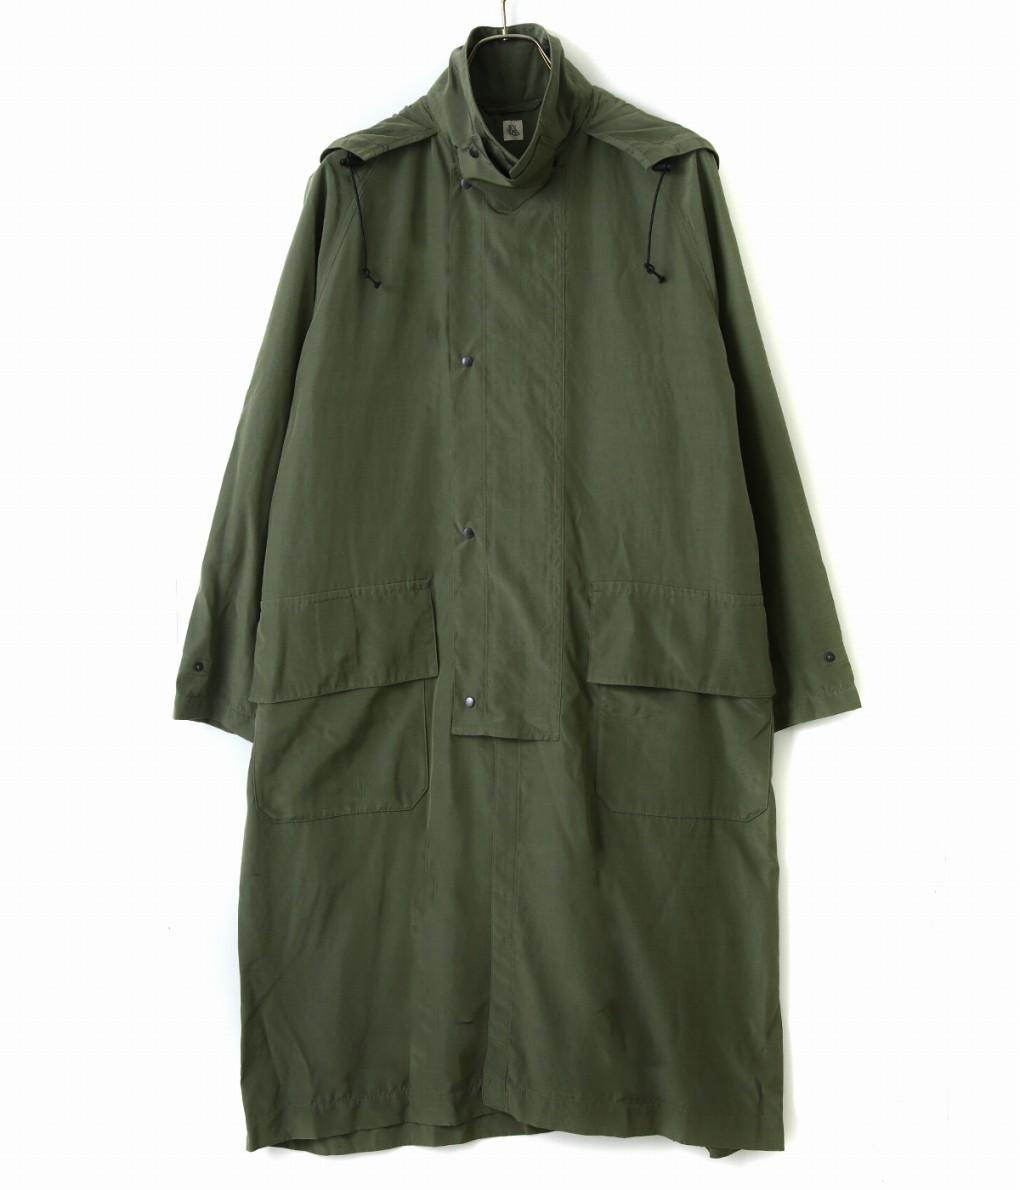 KAPTAIN SUNSHINE / キャプテン サンシャイン : Bushman Coat : コート アウター ブッシュマンコート メンズ : KS9SCO02 【NOA】